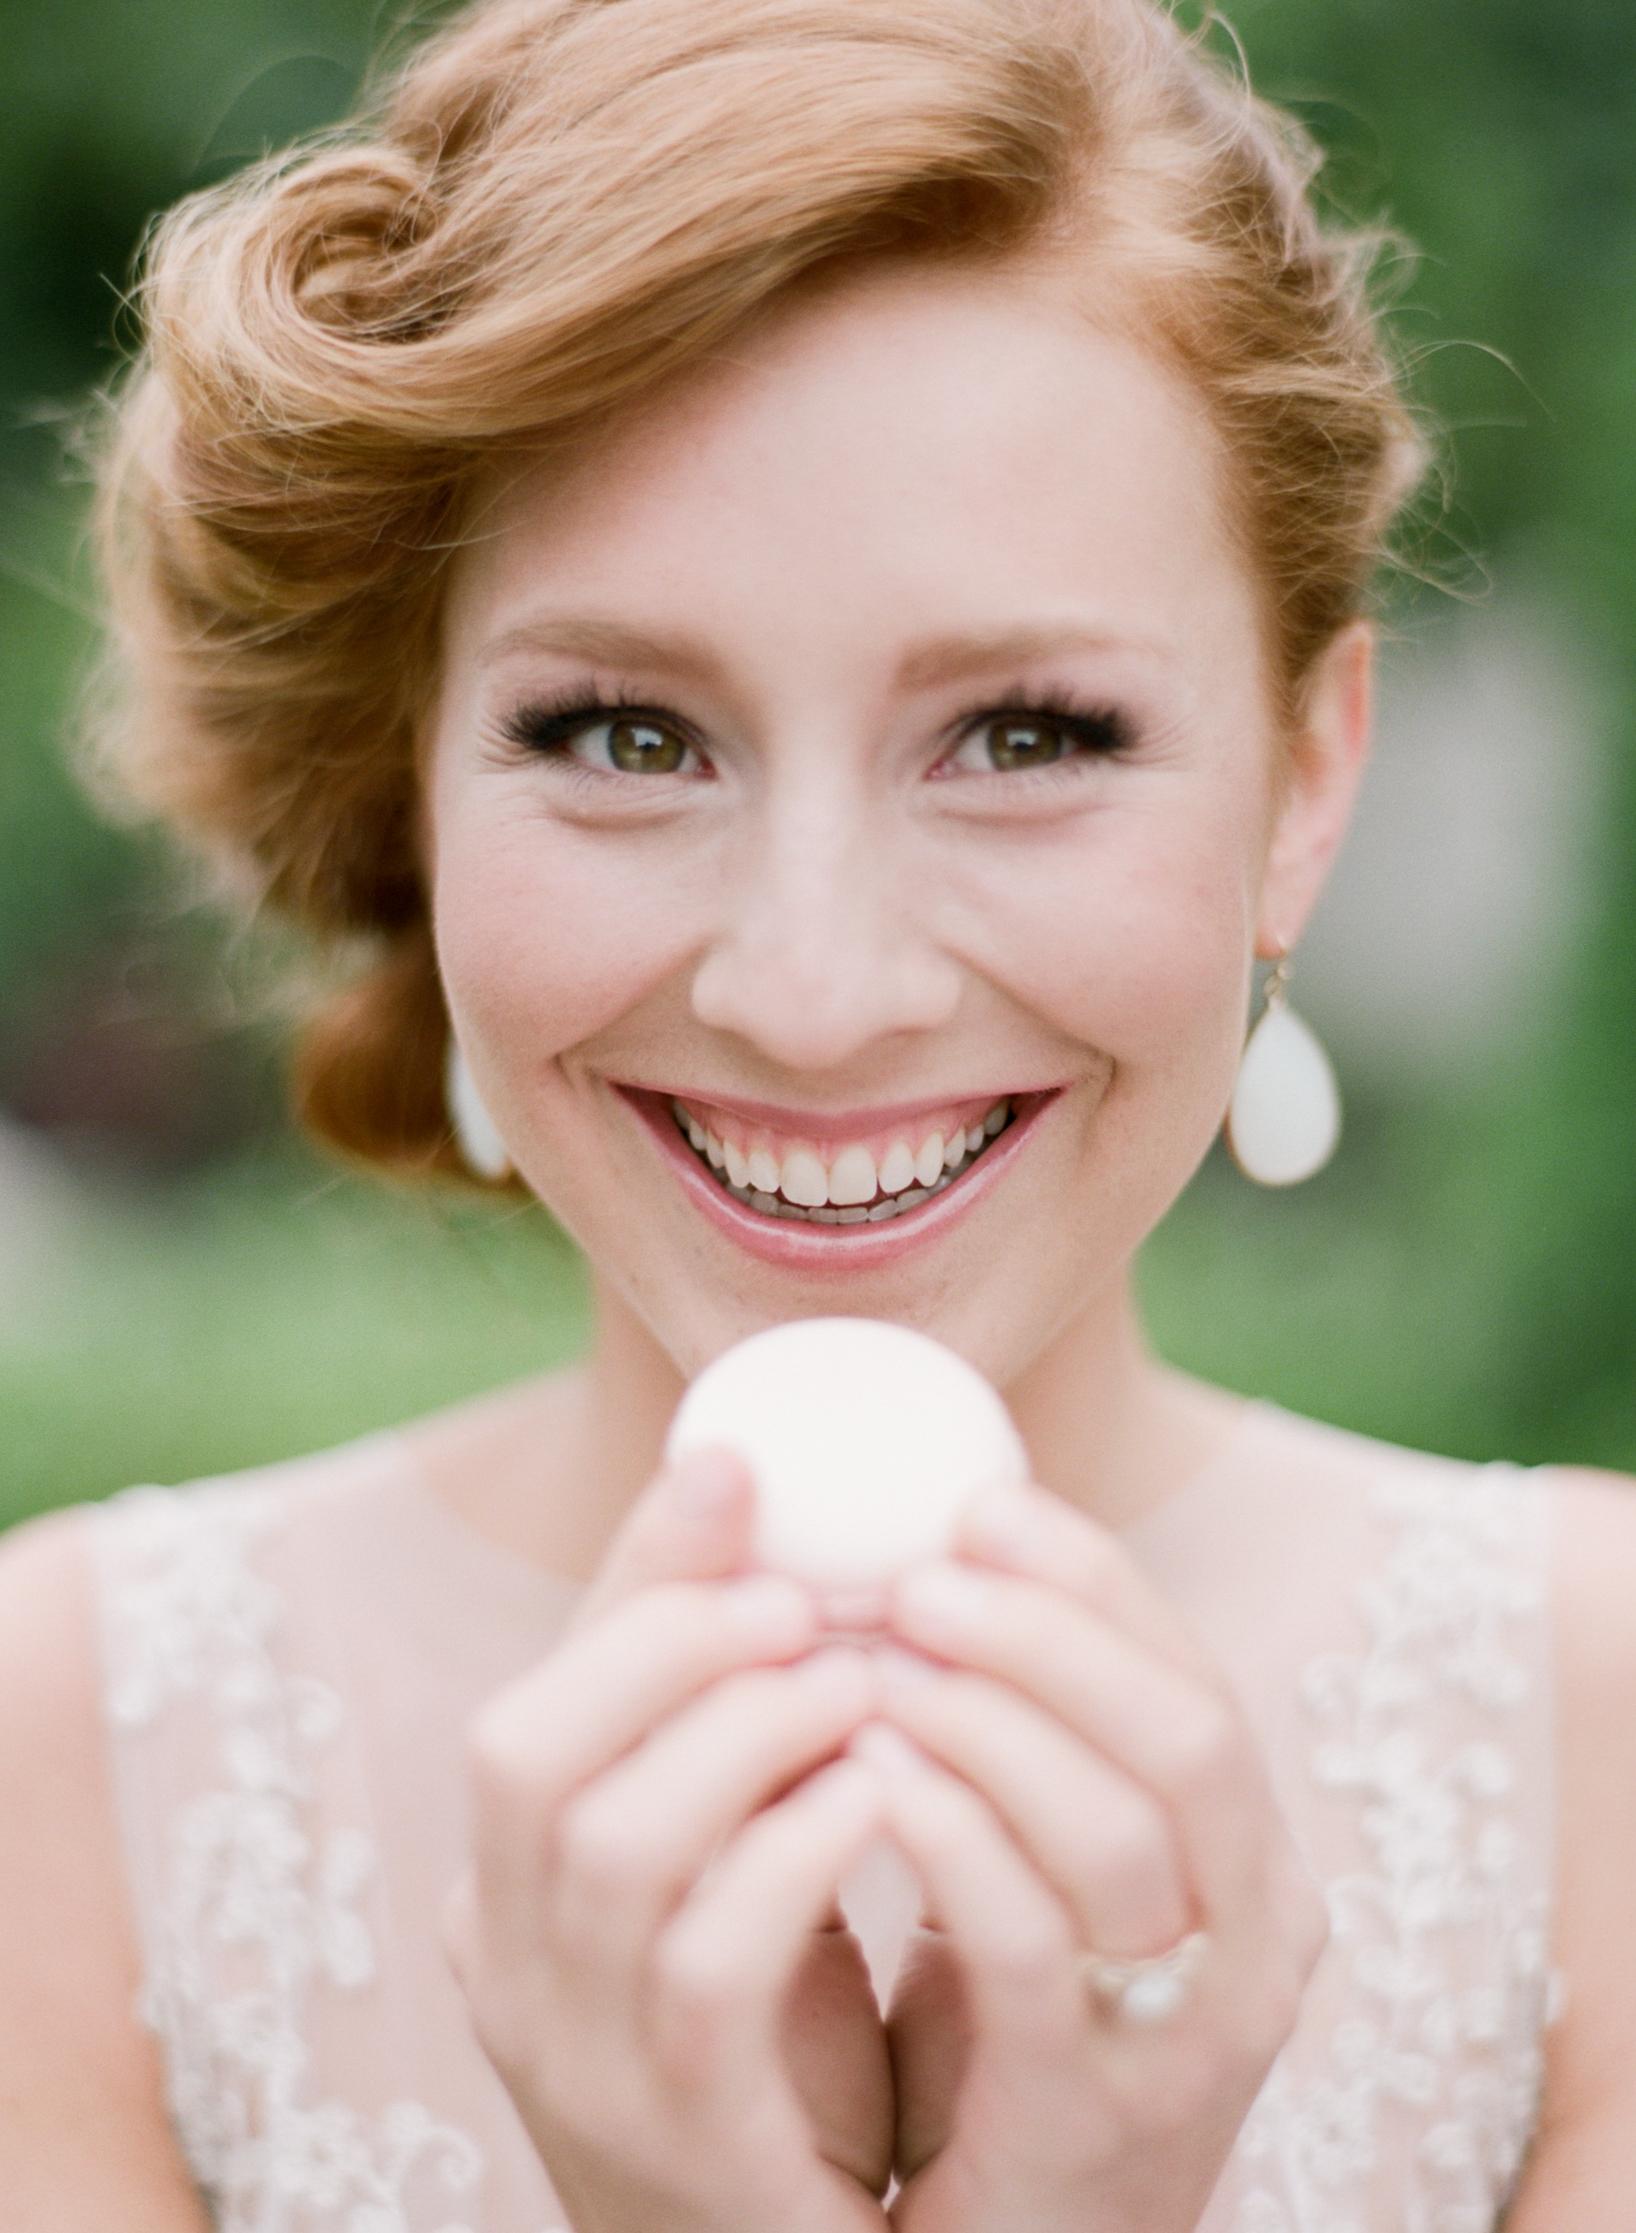 099-80940032SylvieGil-Paris-macaroons-red hair bride-romantic wedding-french wedding.jpg